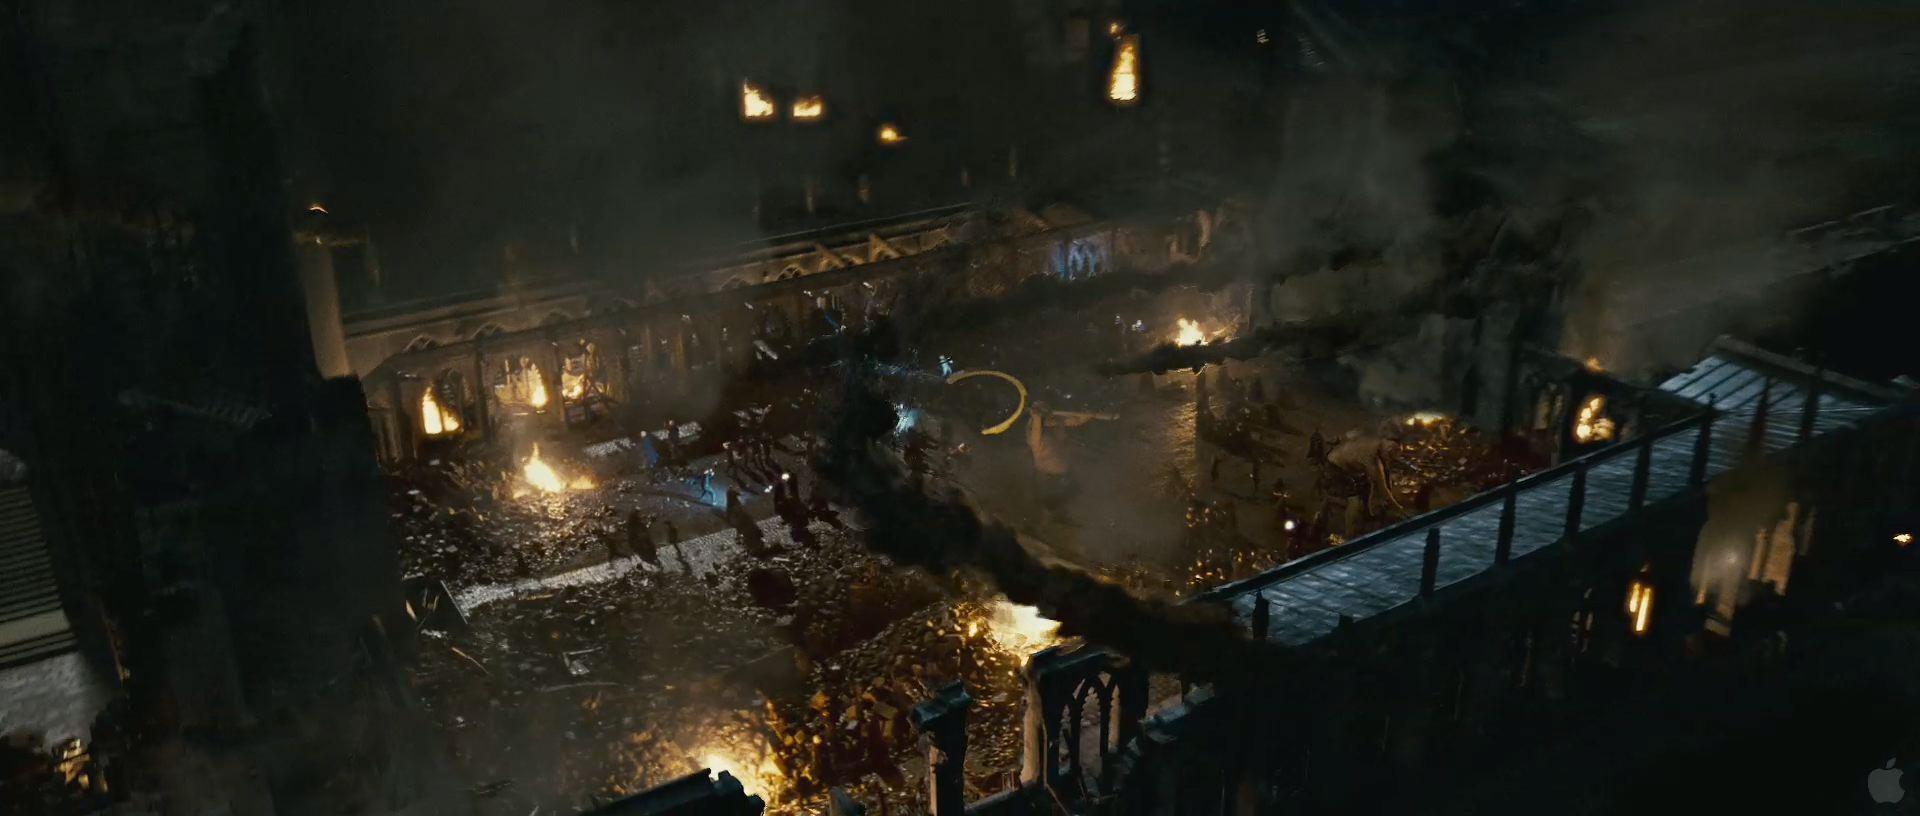 Harry Potter BlogHogwarts HP7 2 Trailer 69